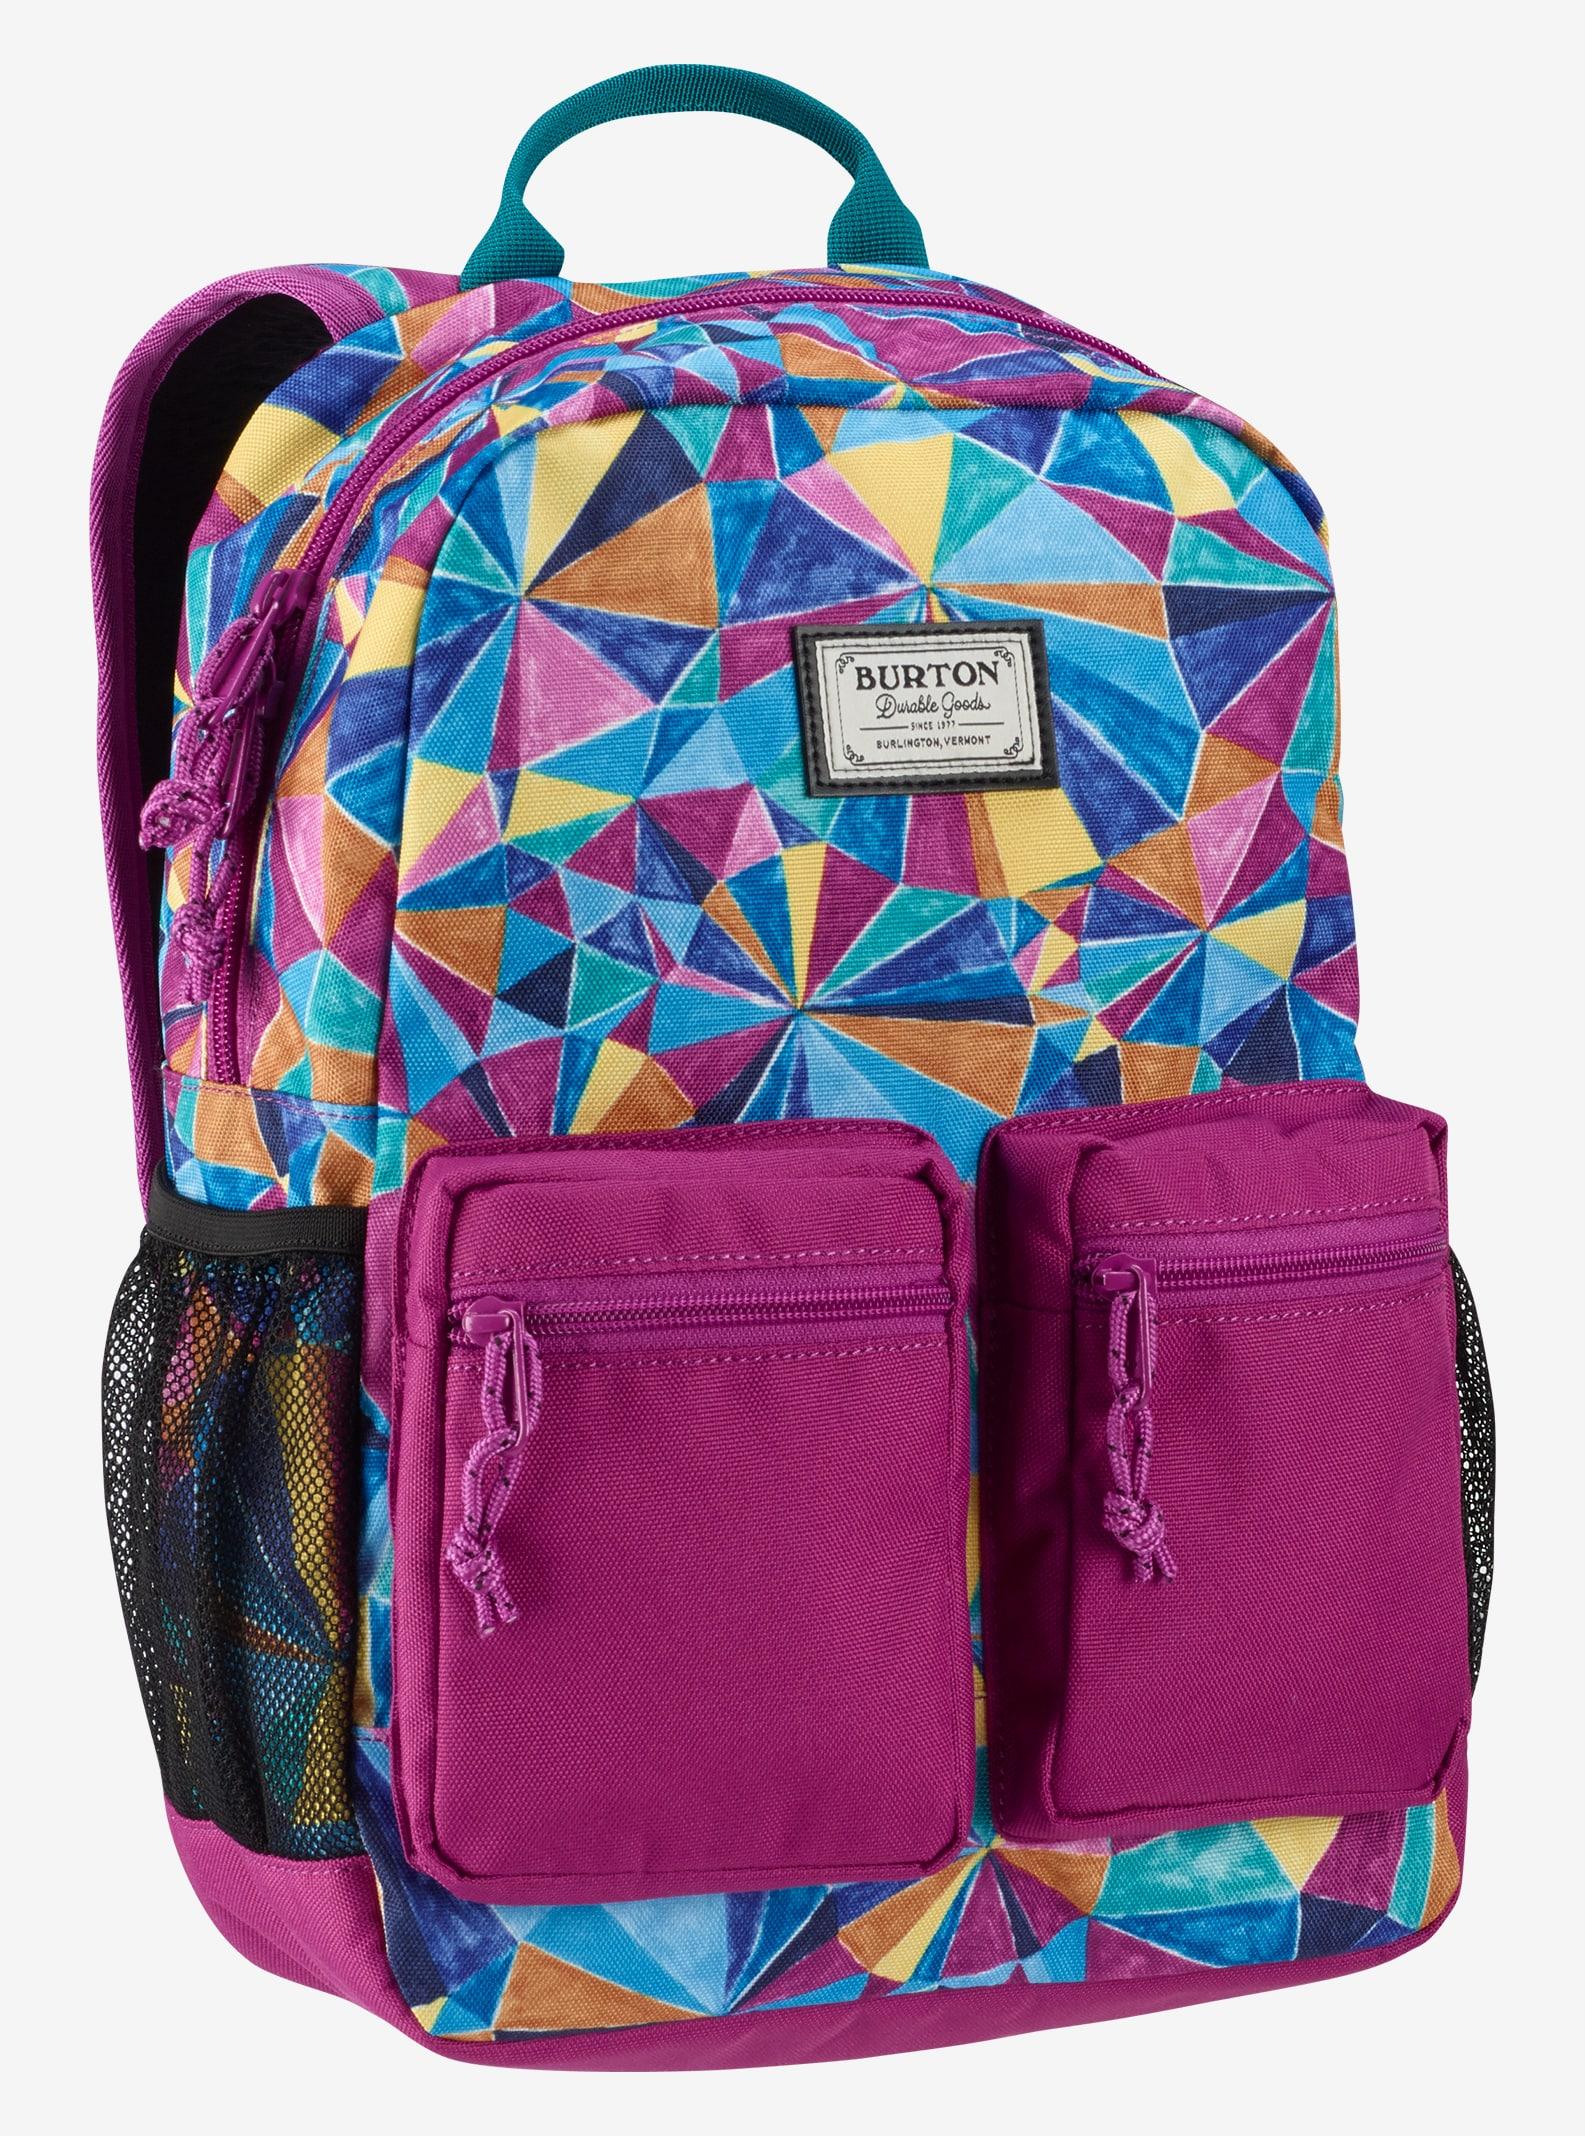 Burton Kids' Gromlet Backpack shown in Polka Diamond Print